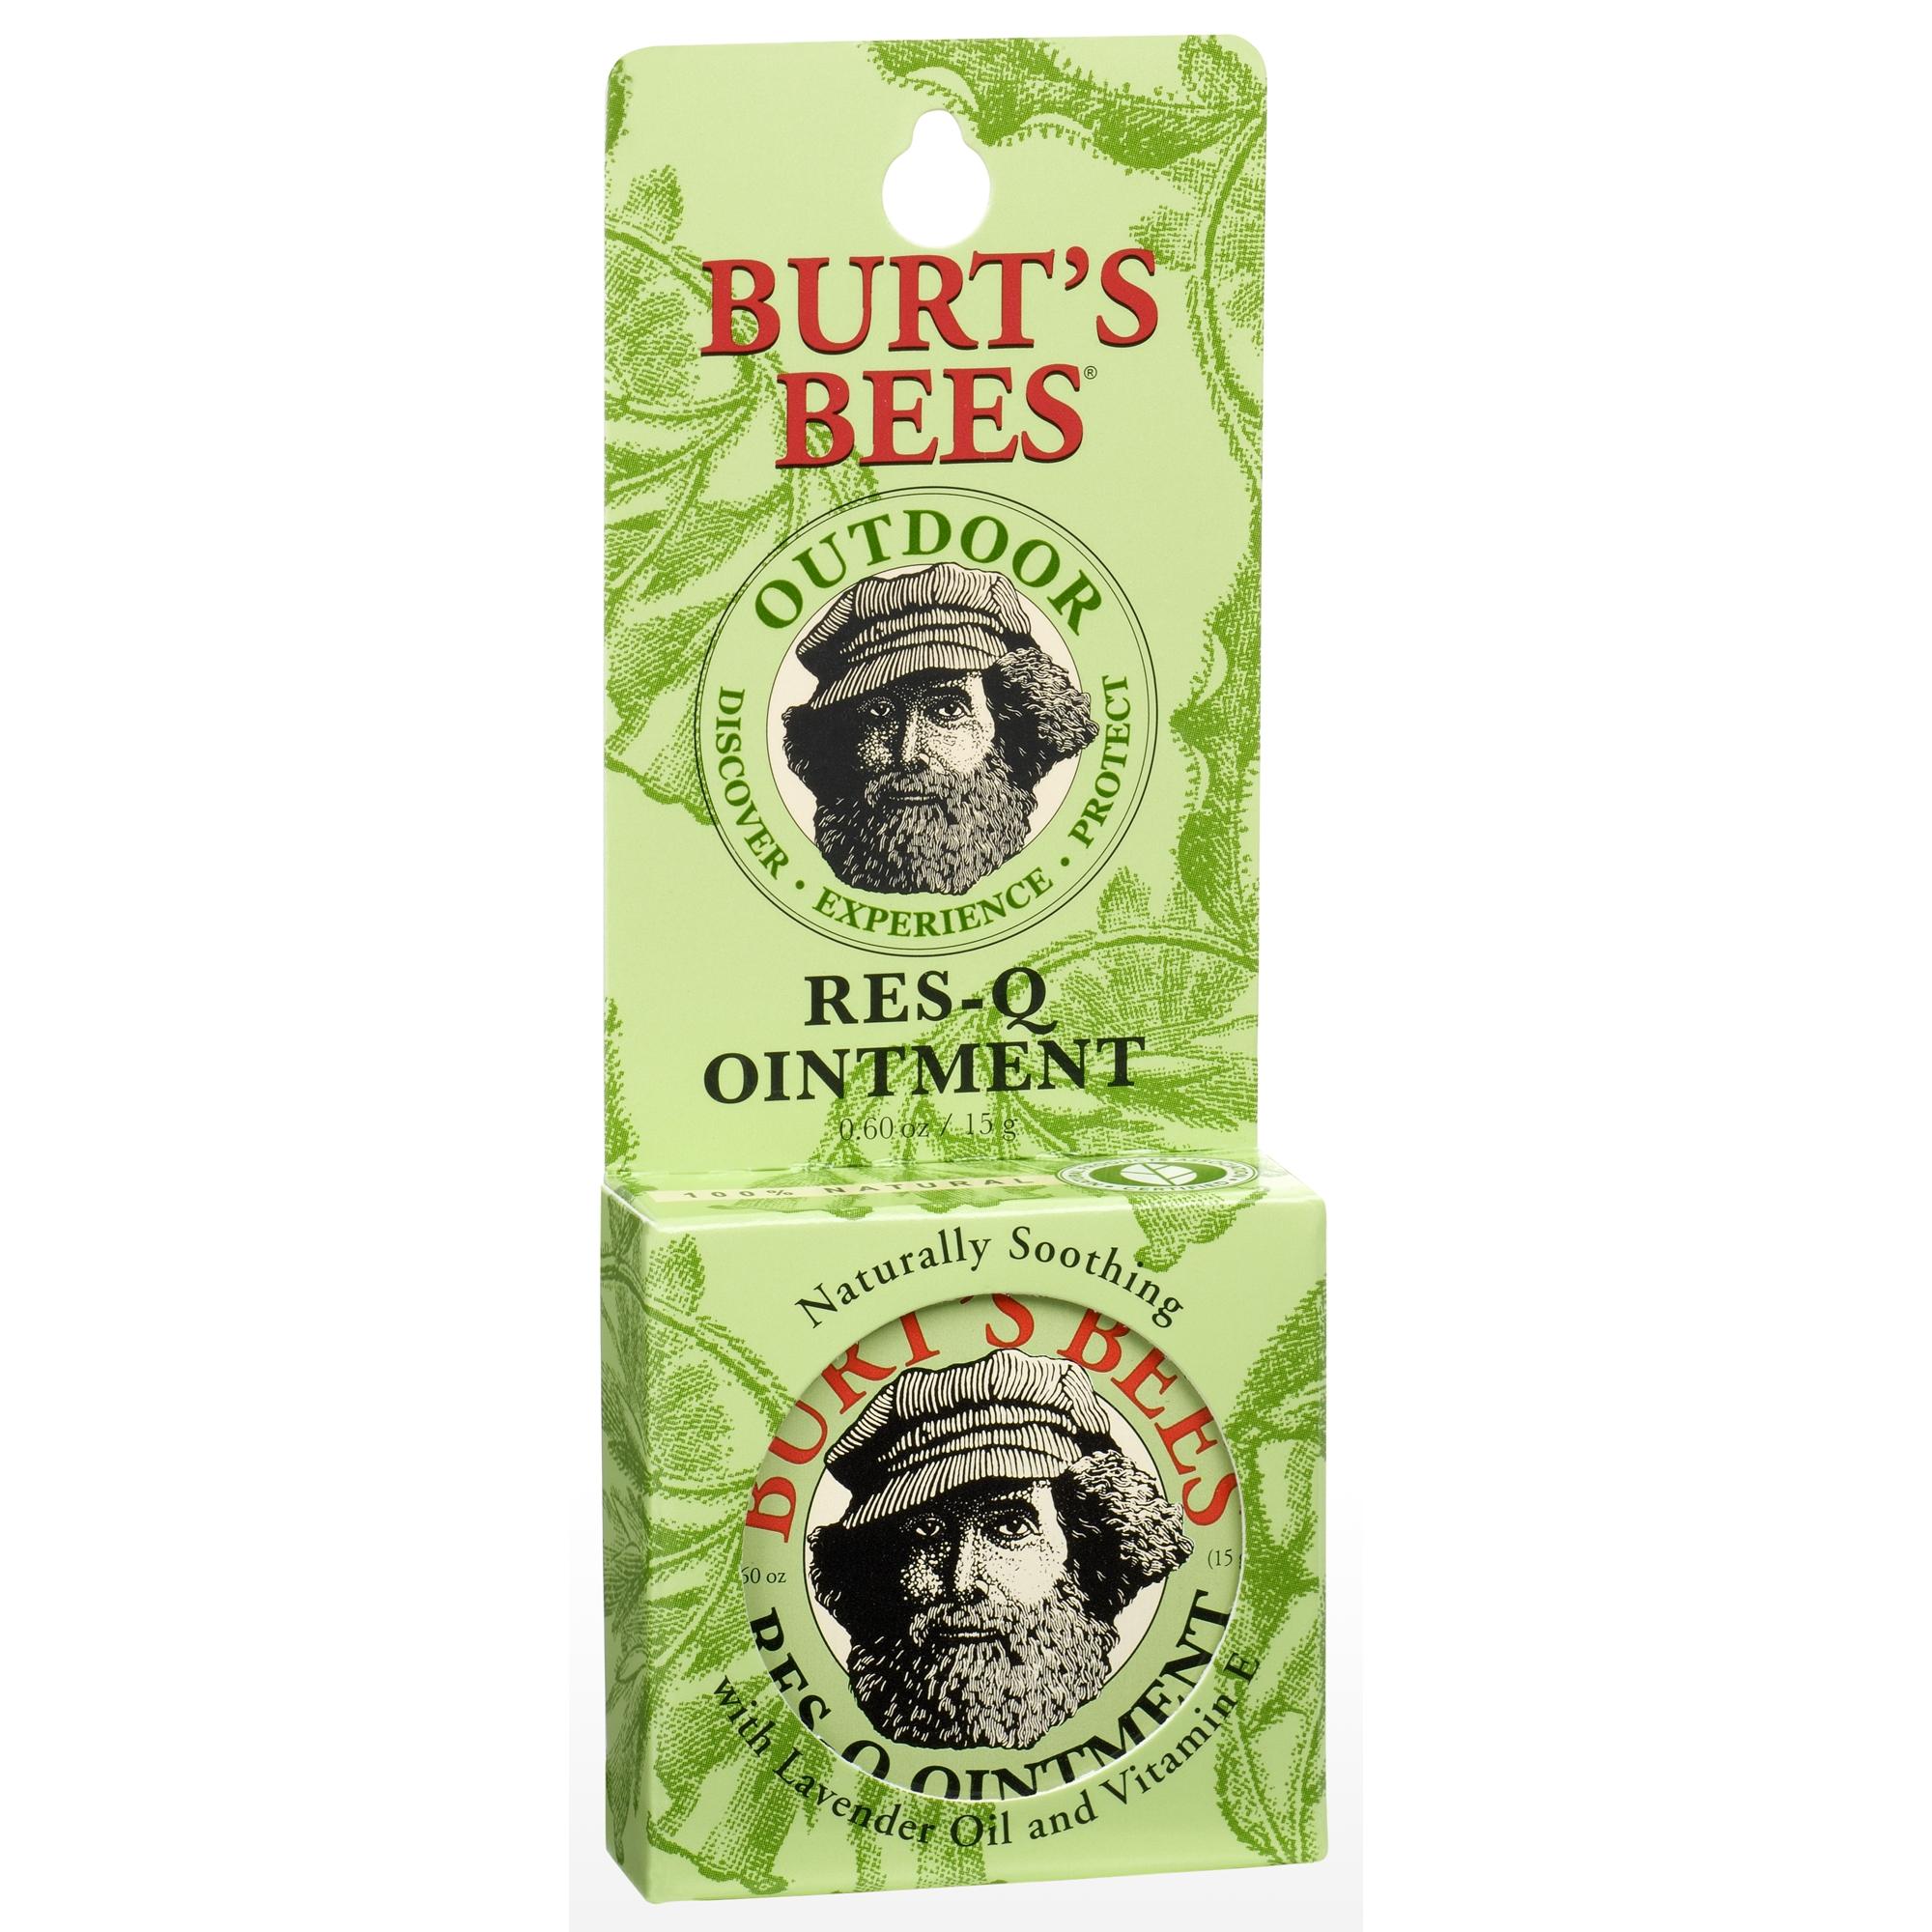 Burt's Bees 100% Natural Res-Q Ointment, Multipurpose Balm - 0.6 oz Tin